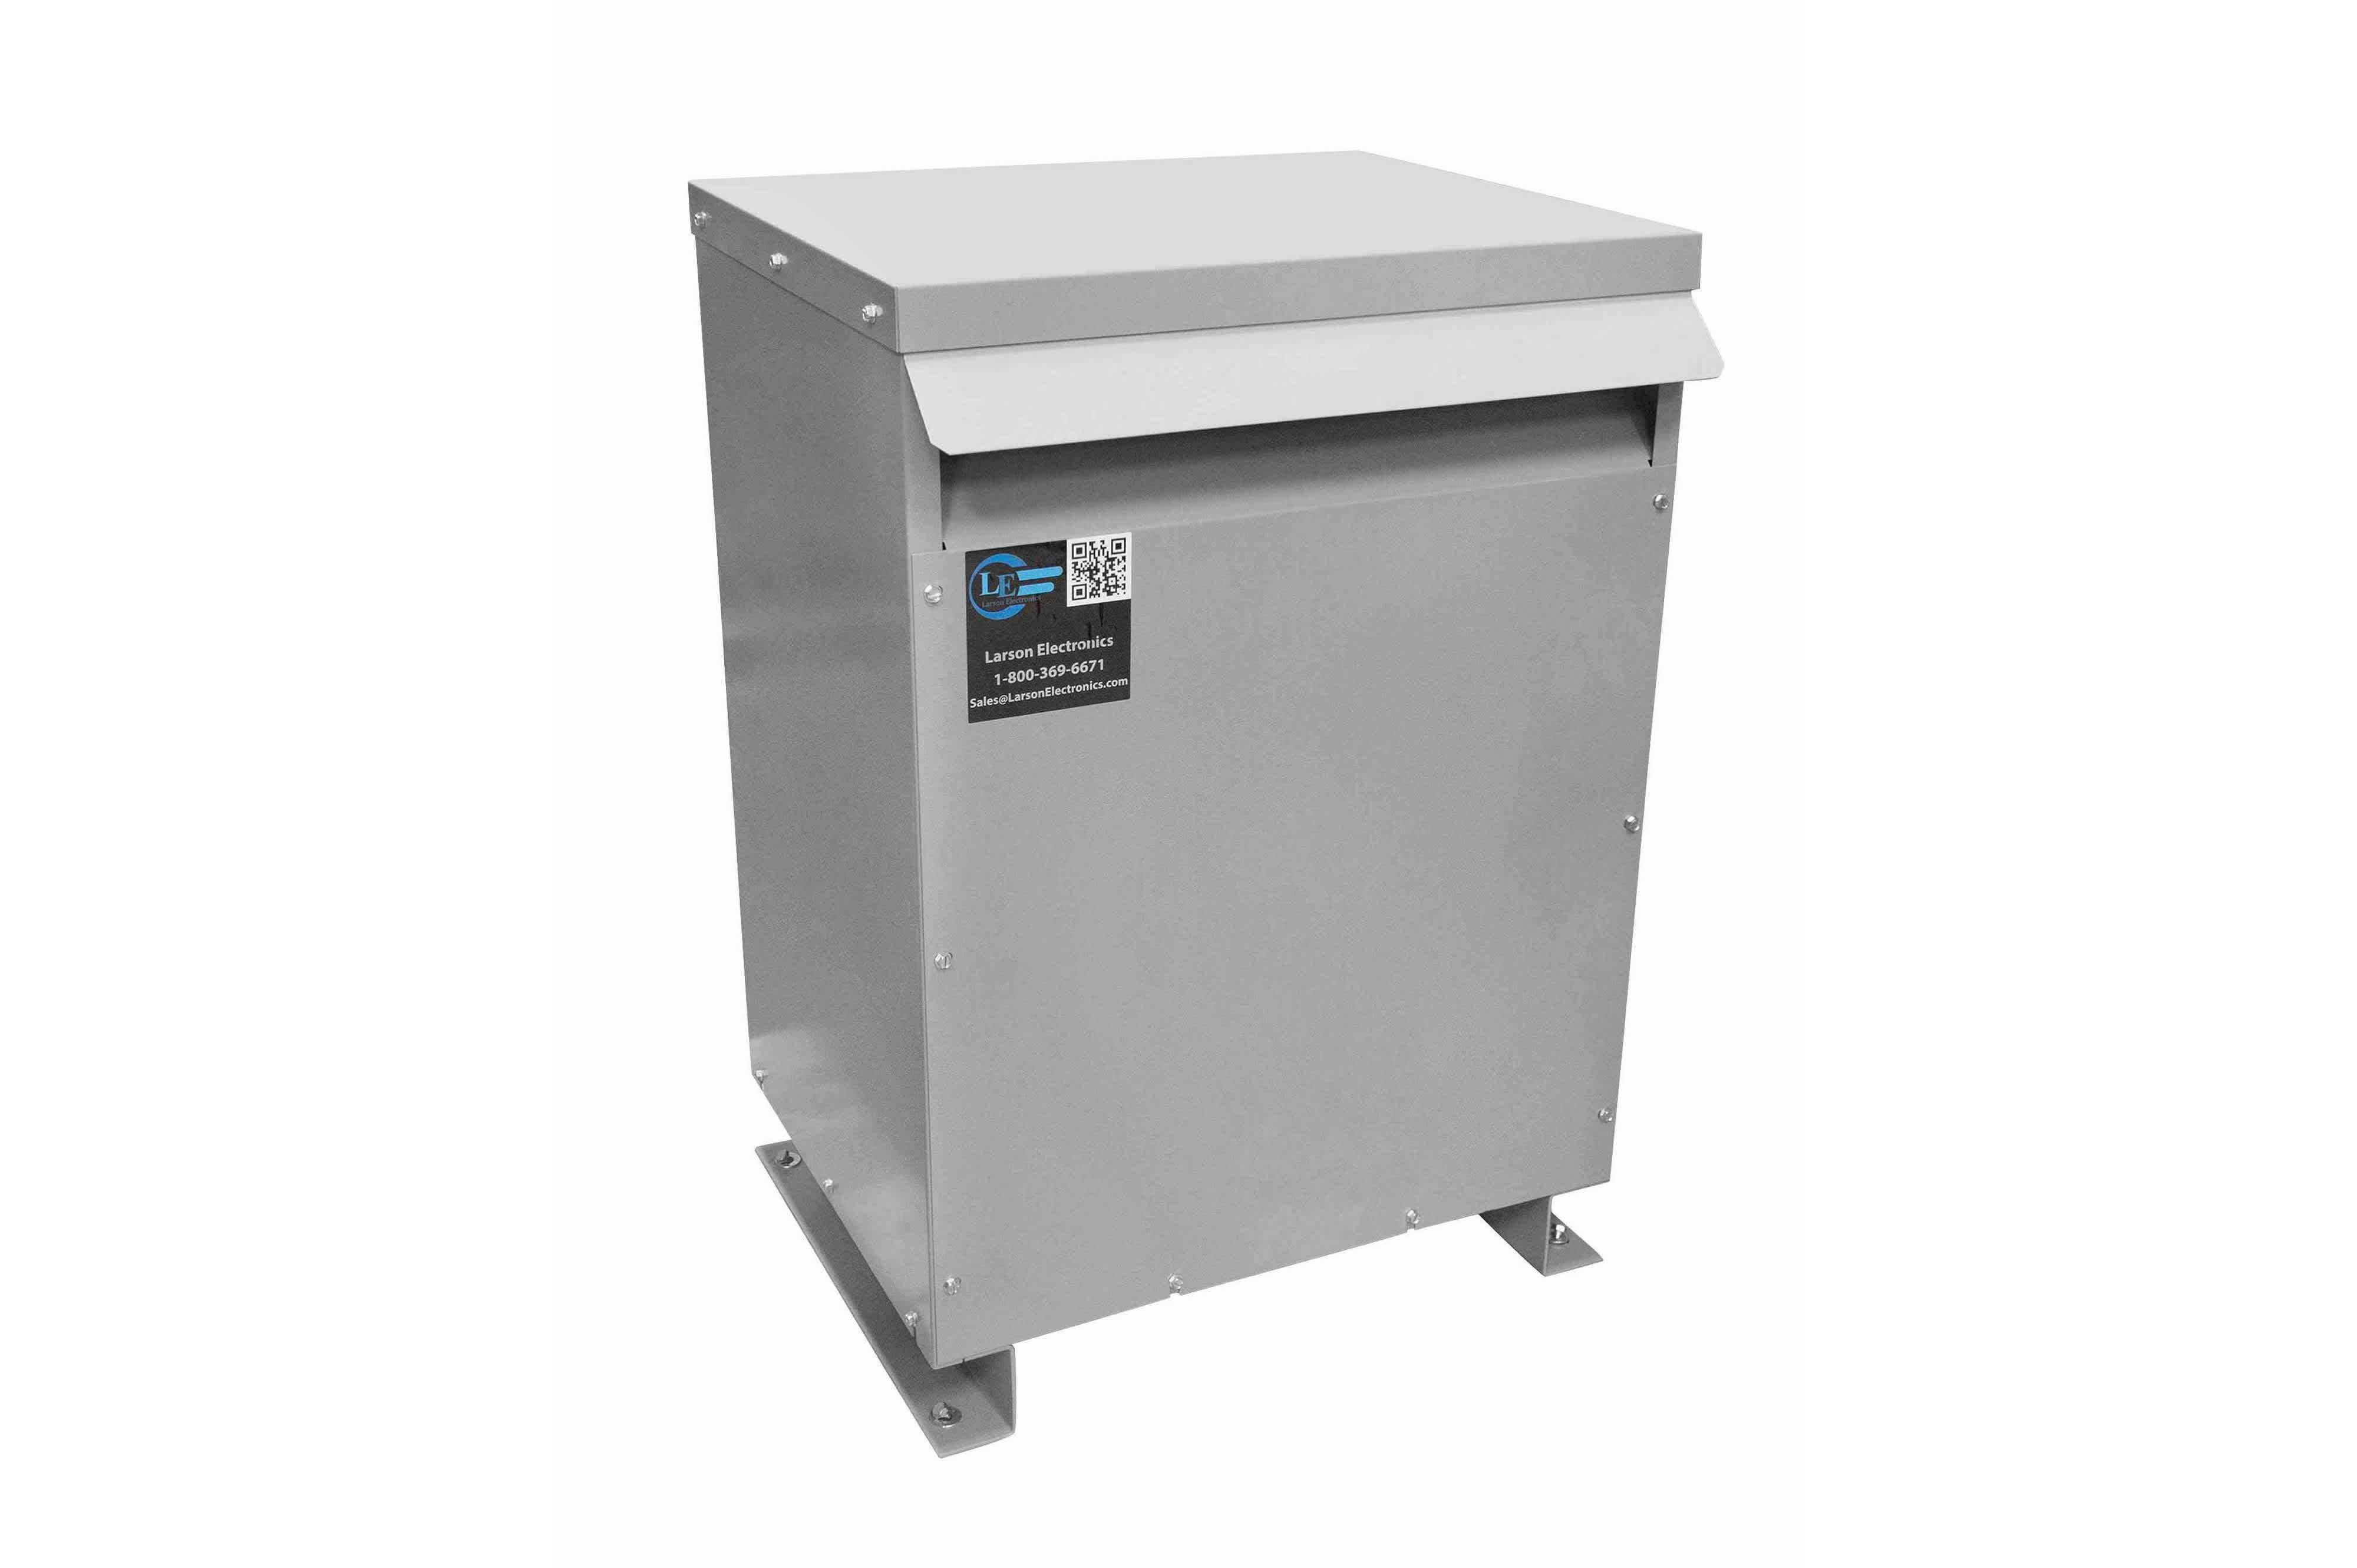 28 kVA 3PH Isolation Transformer, 208V Wye Primary, 480V Delta Secondary, N3R, Ventilated, 60 Hz